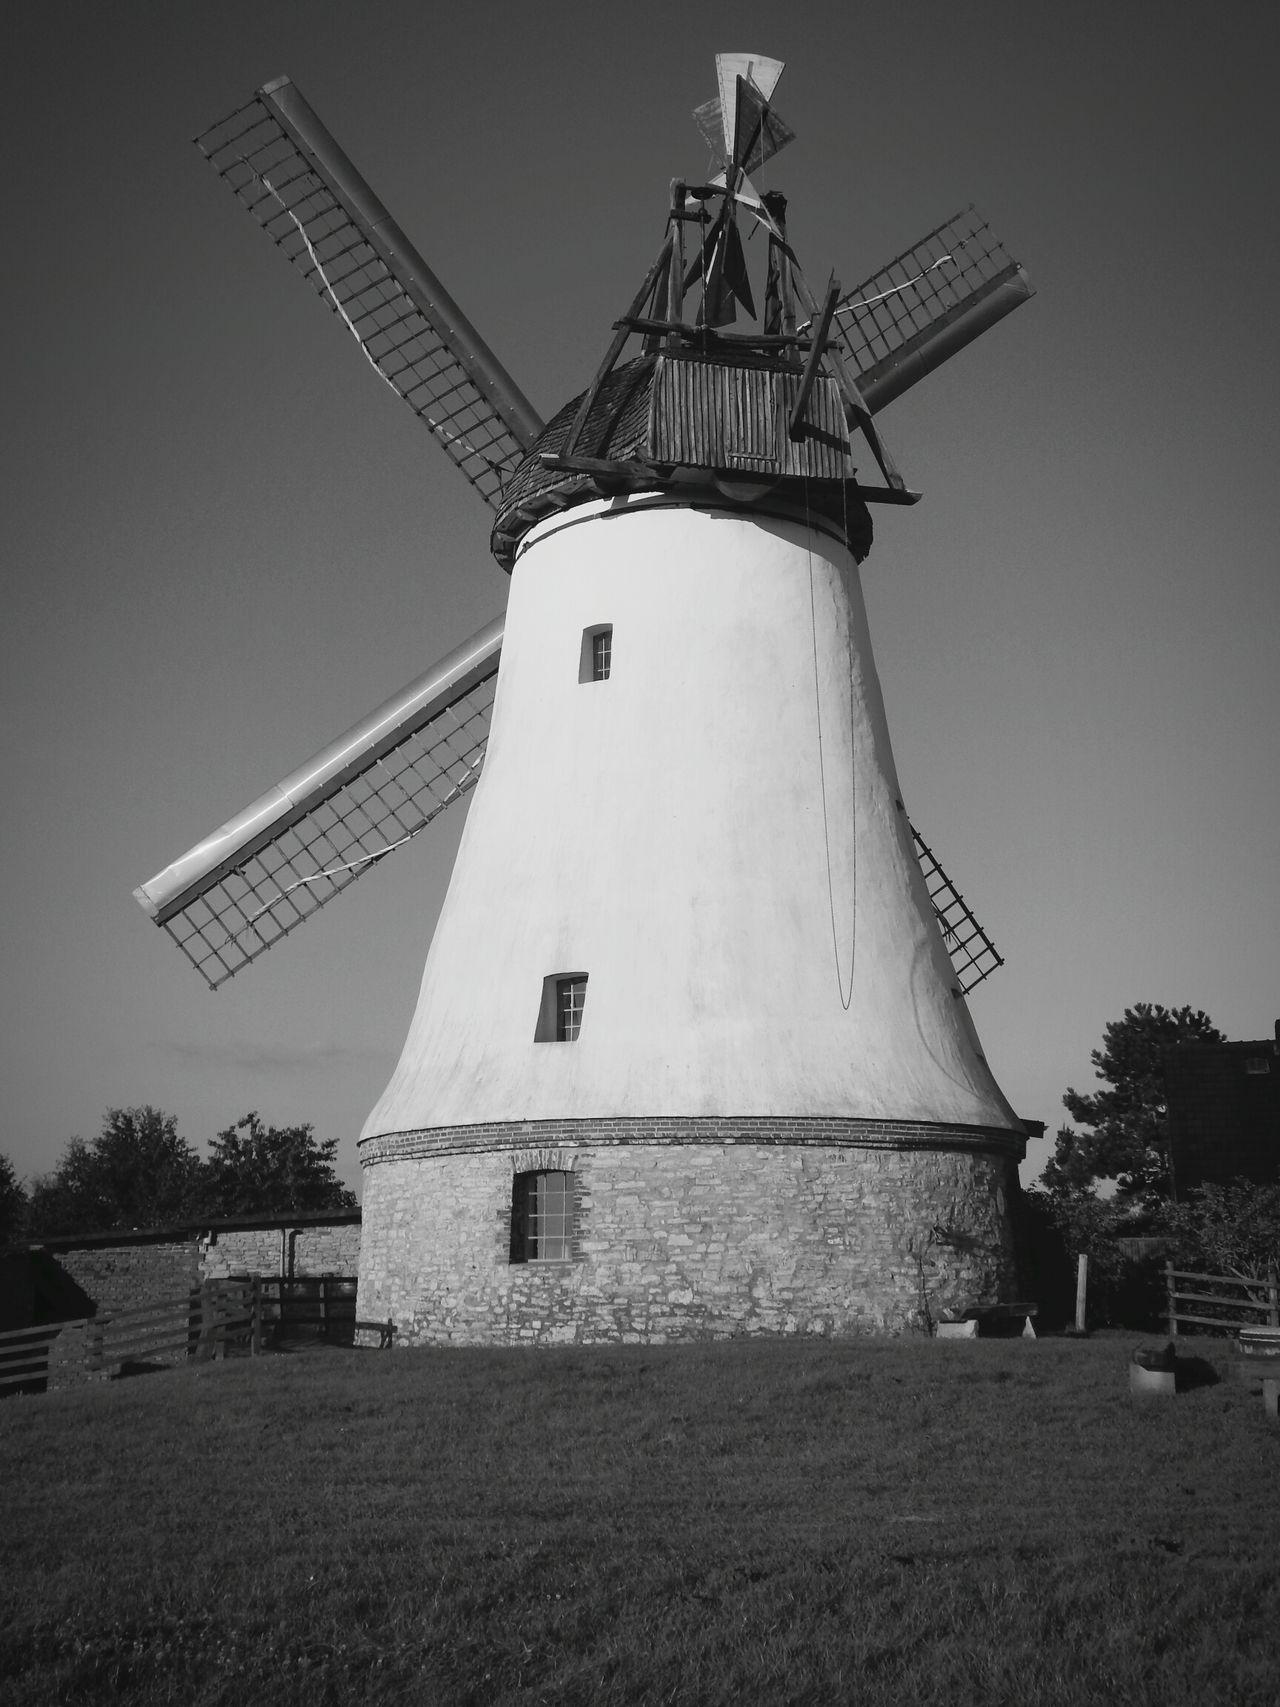 Mill Black & White Sky Quality Quality Time Highquality Digitalphotography Digital Camera